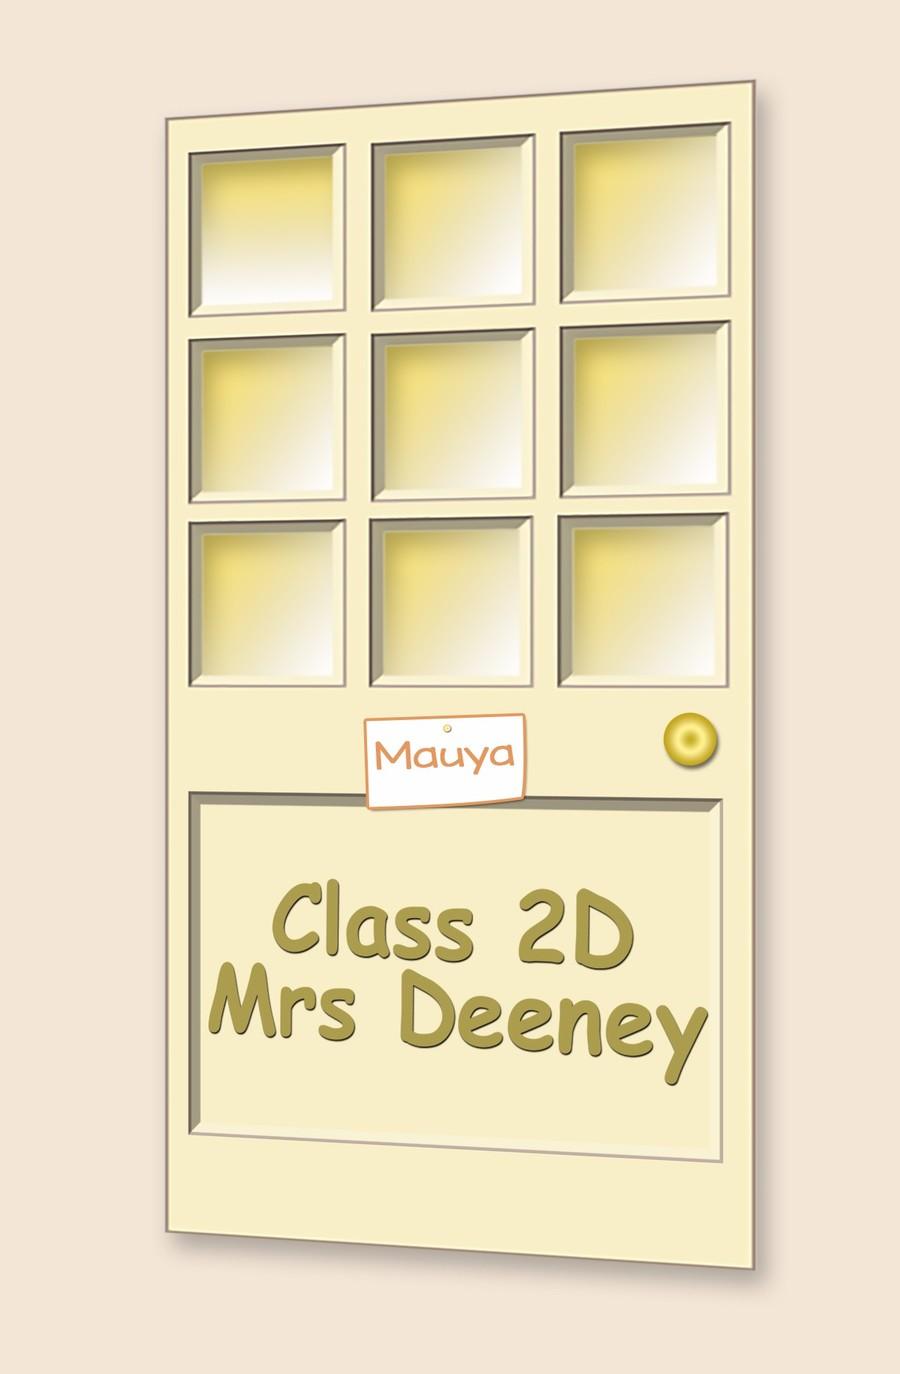 Go to Class 2D